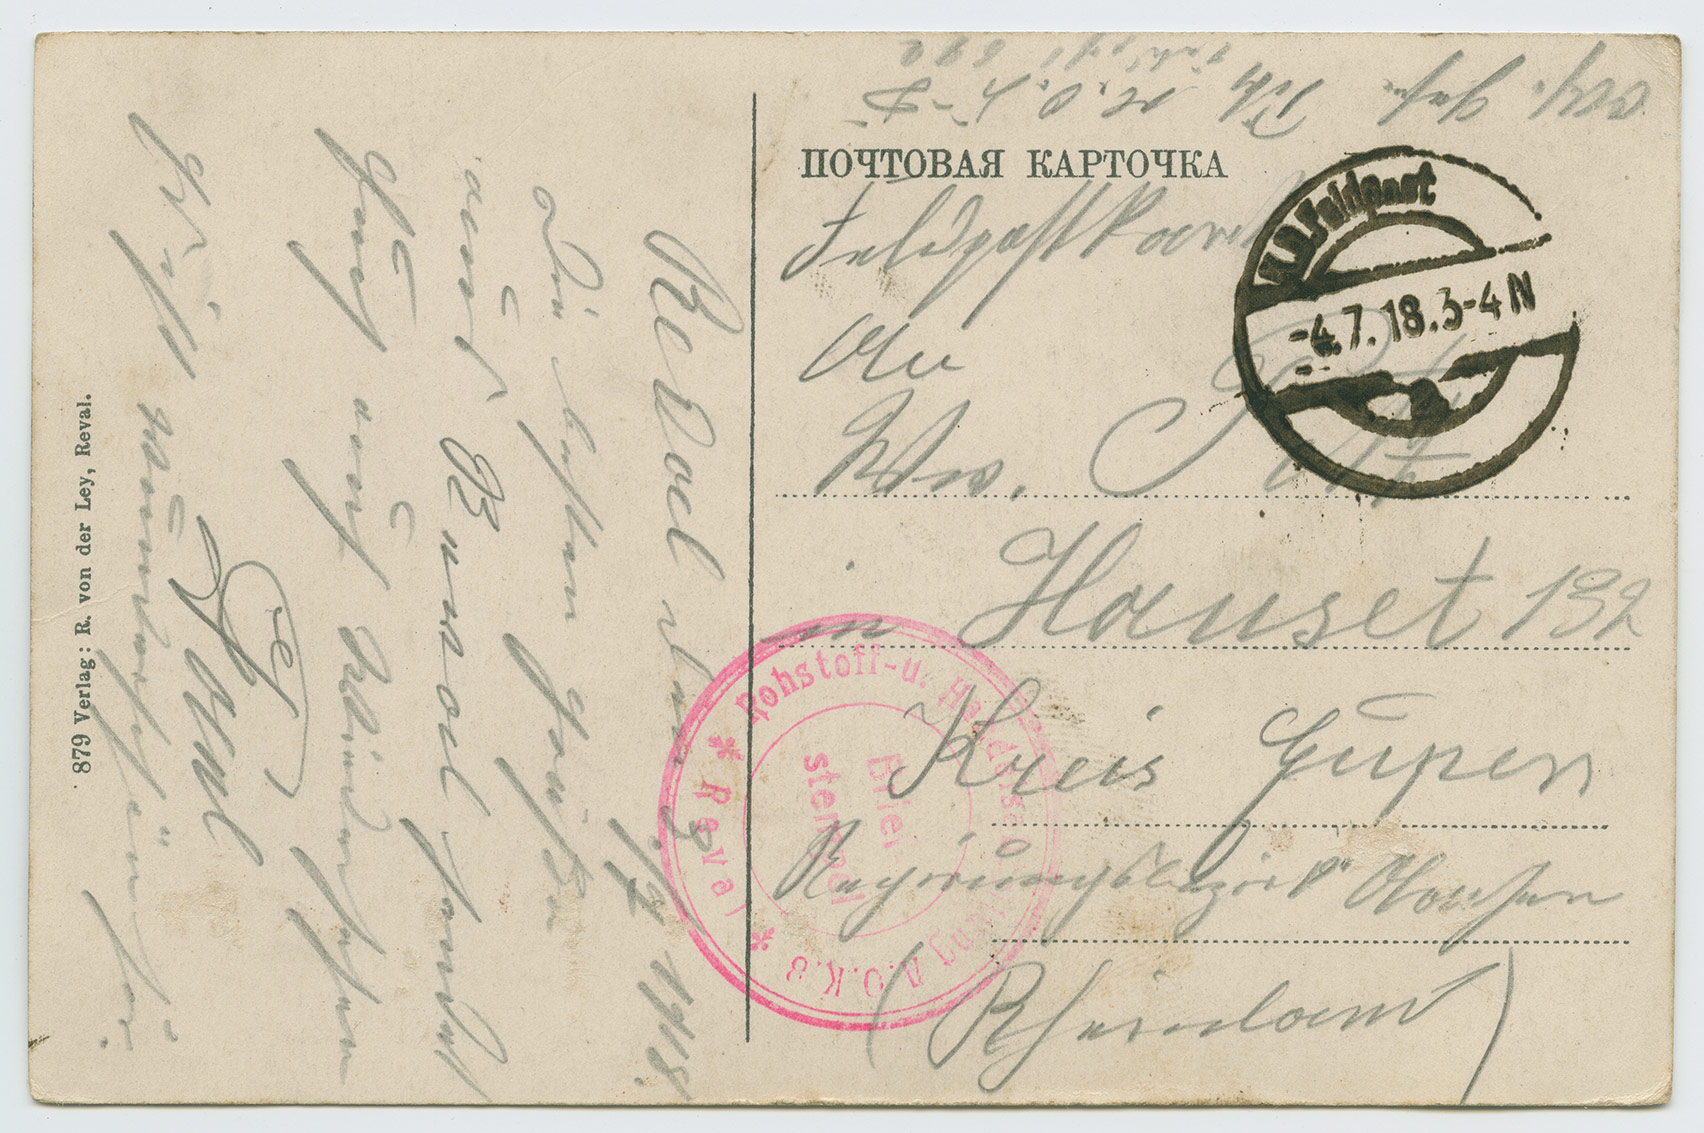 1208a-Rohstoff-und-Händelsabteilung-AOK-8-Reval-1918-postiasjalugu-ee